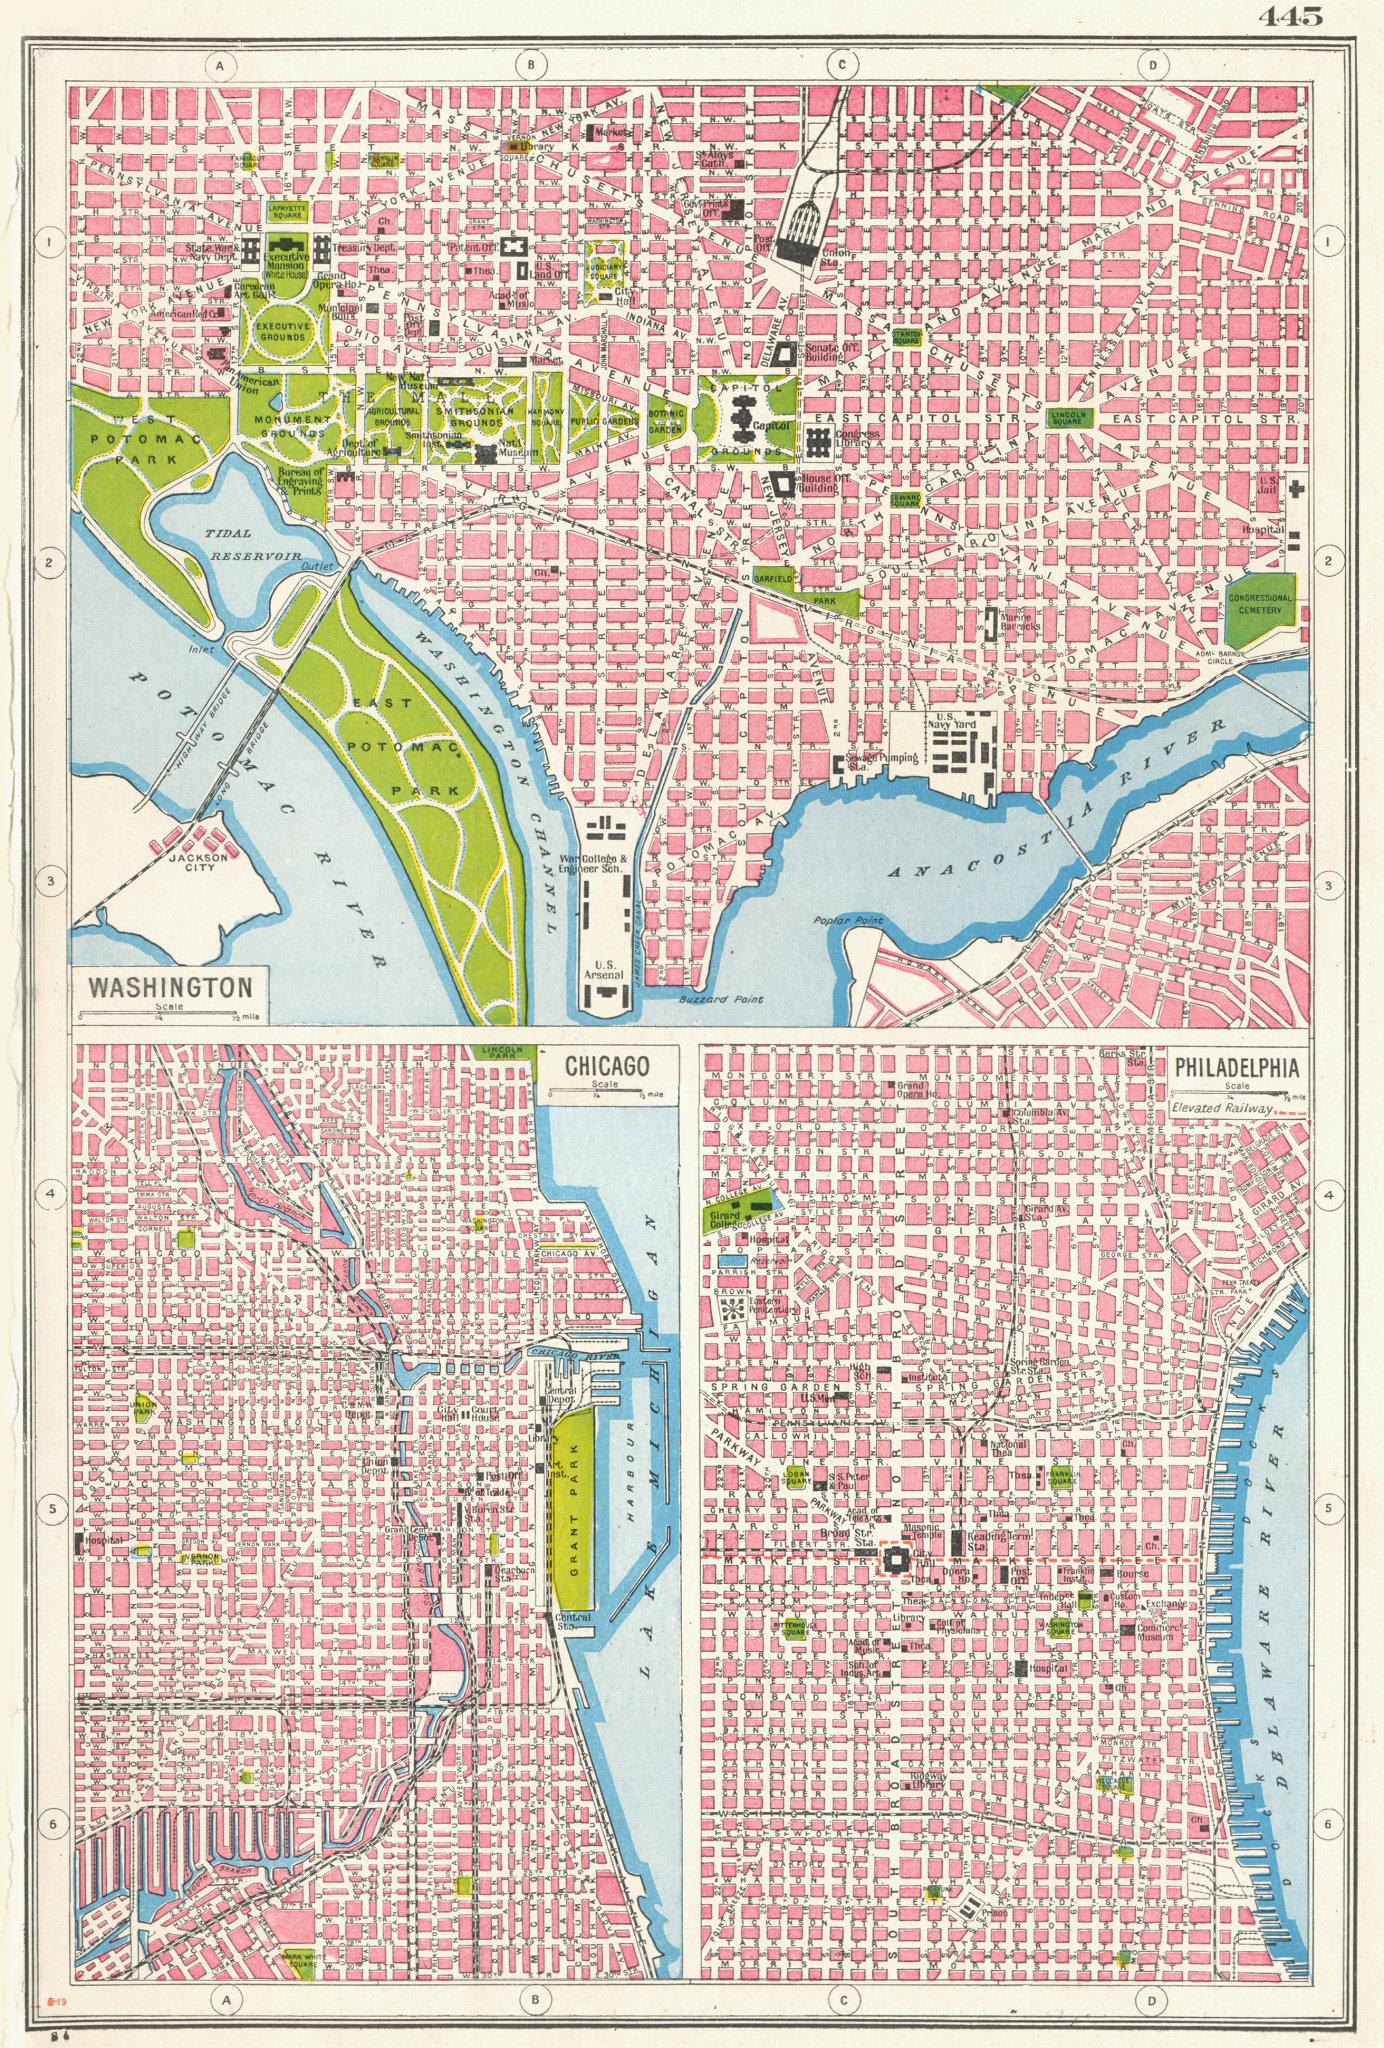 Associate Product USA CITIES. Washington DC Chicago & Philadelphia city plans 1920 old map